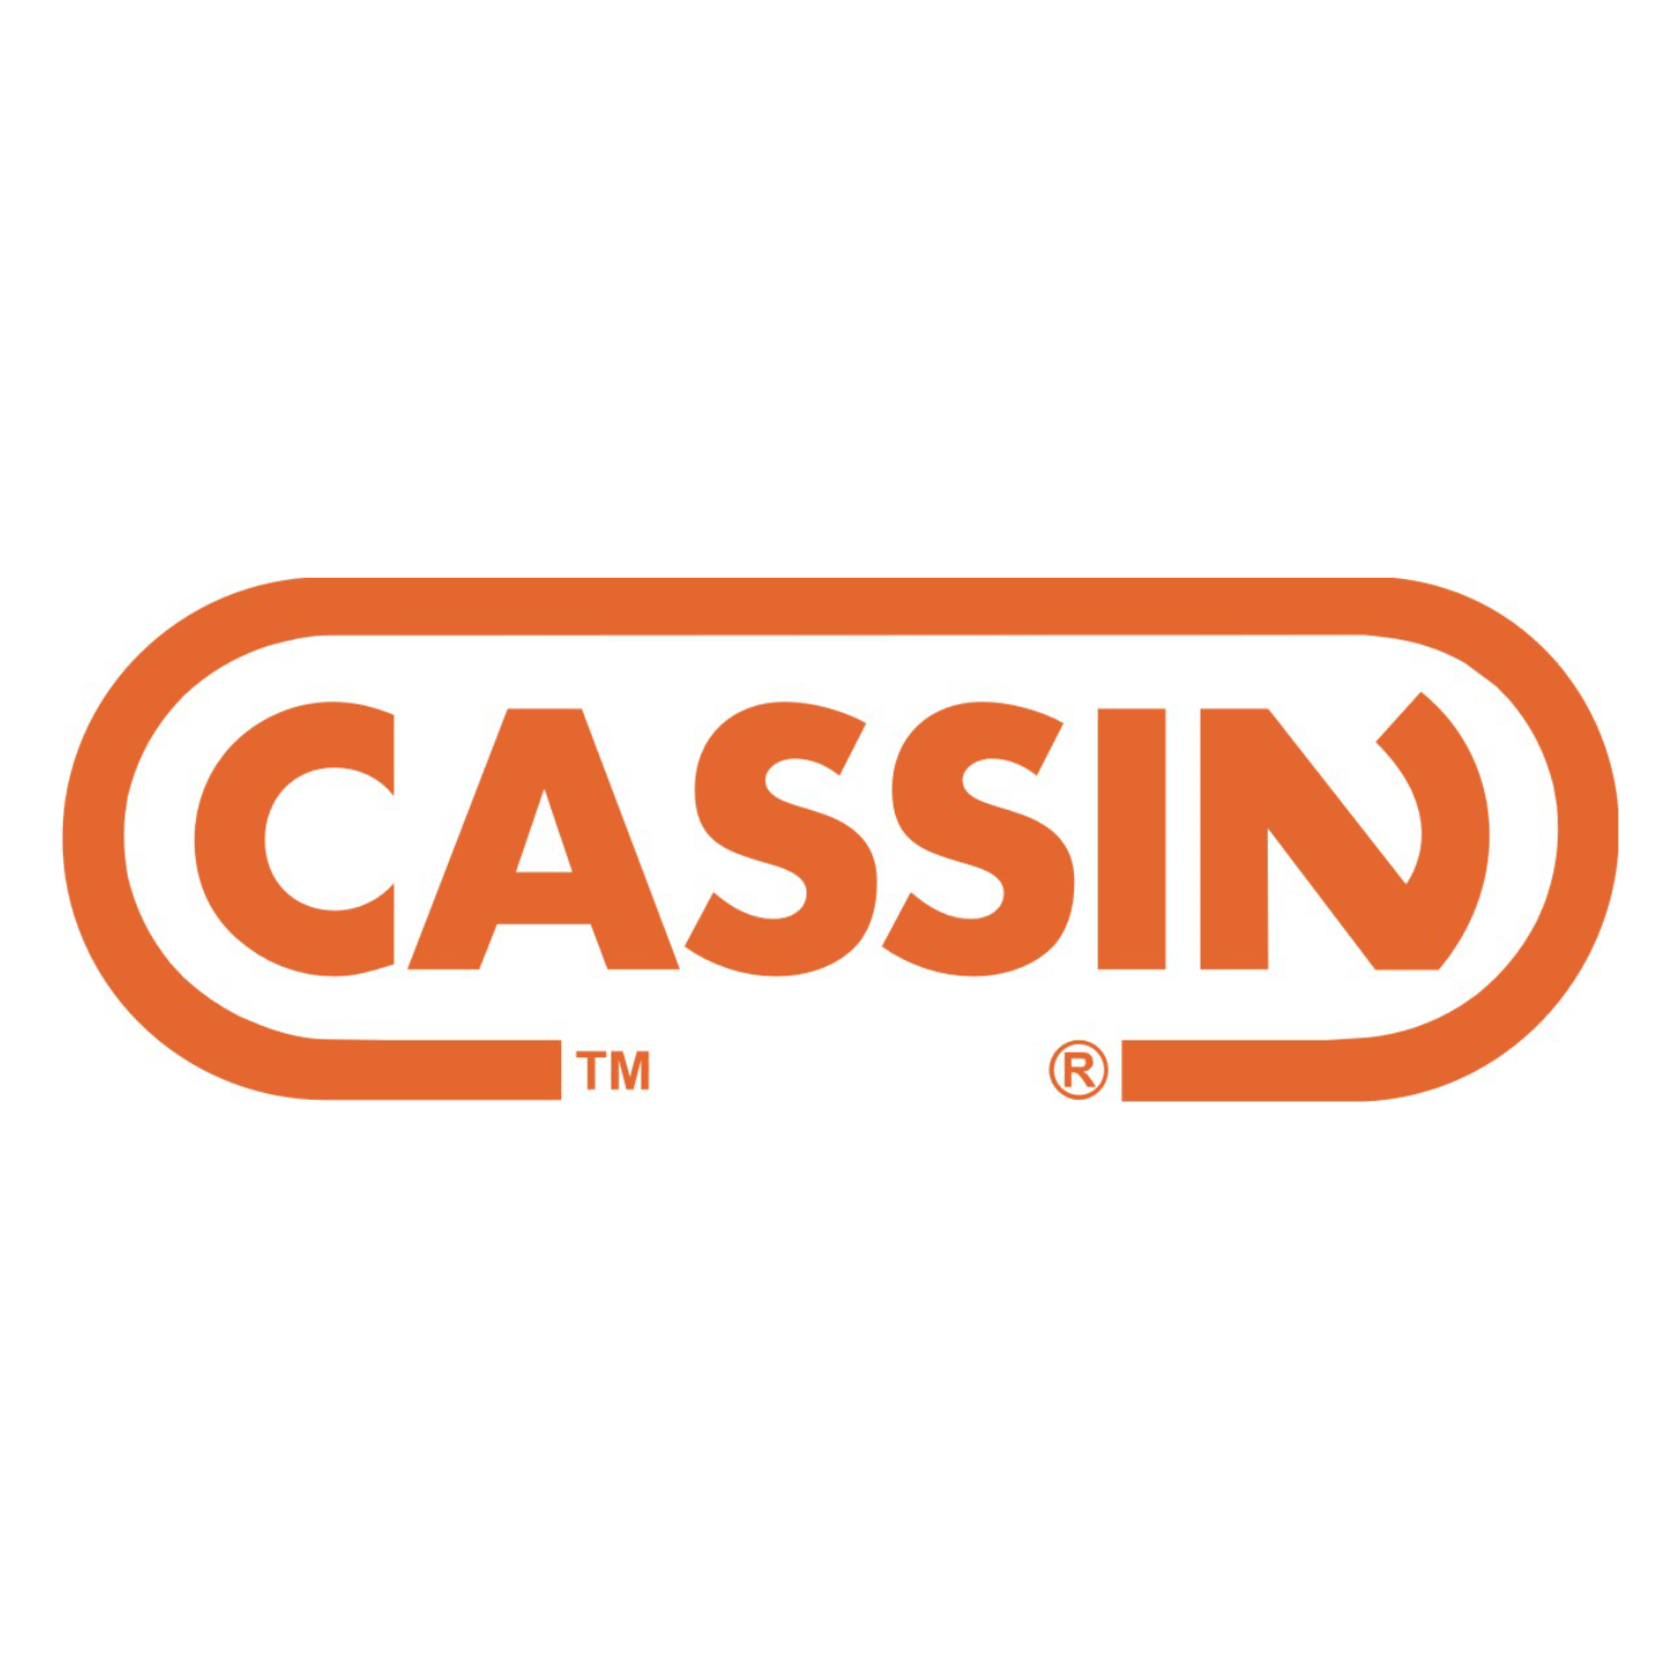 Cassin shop online